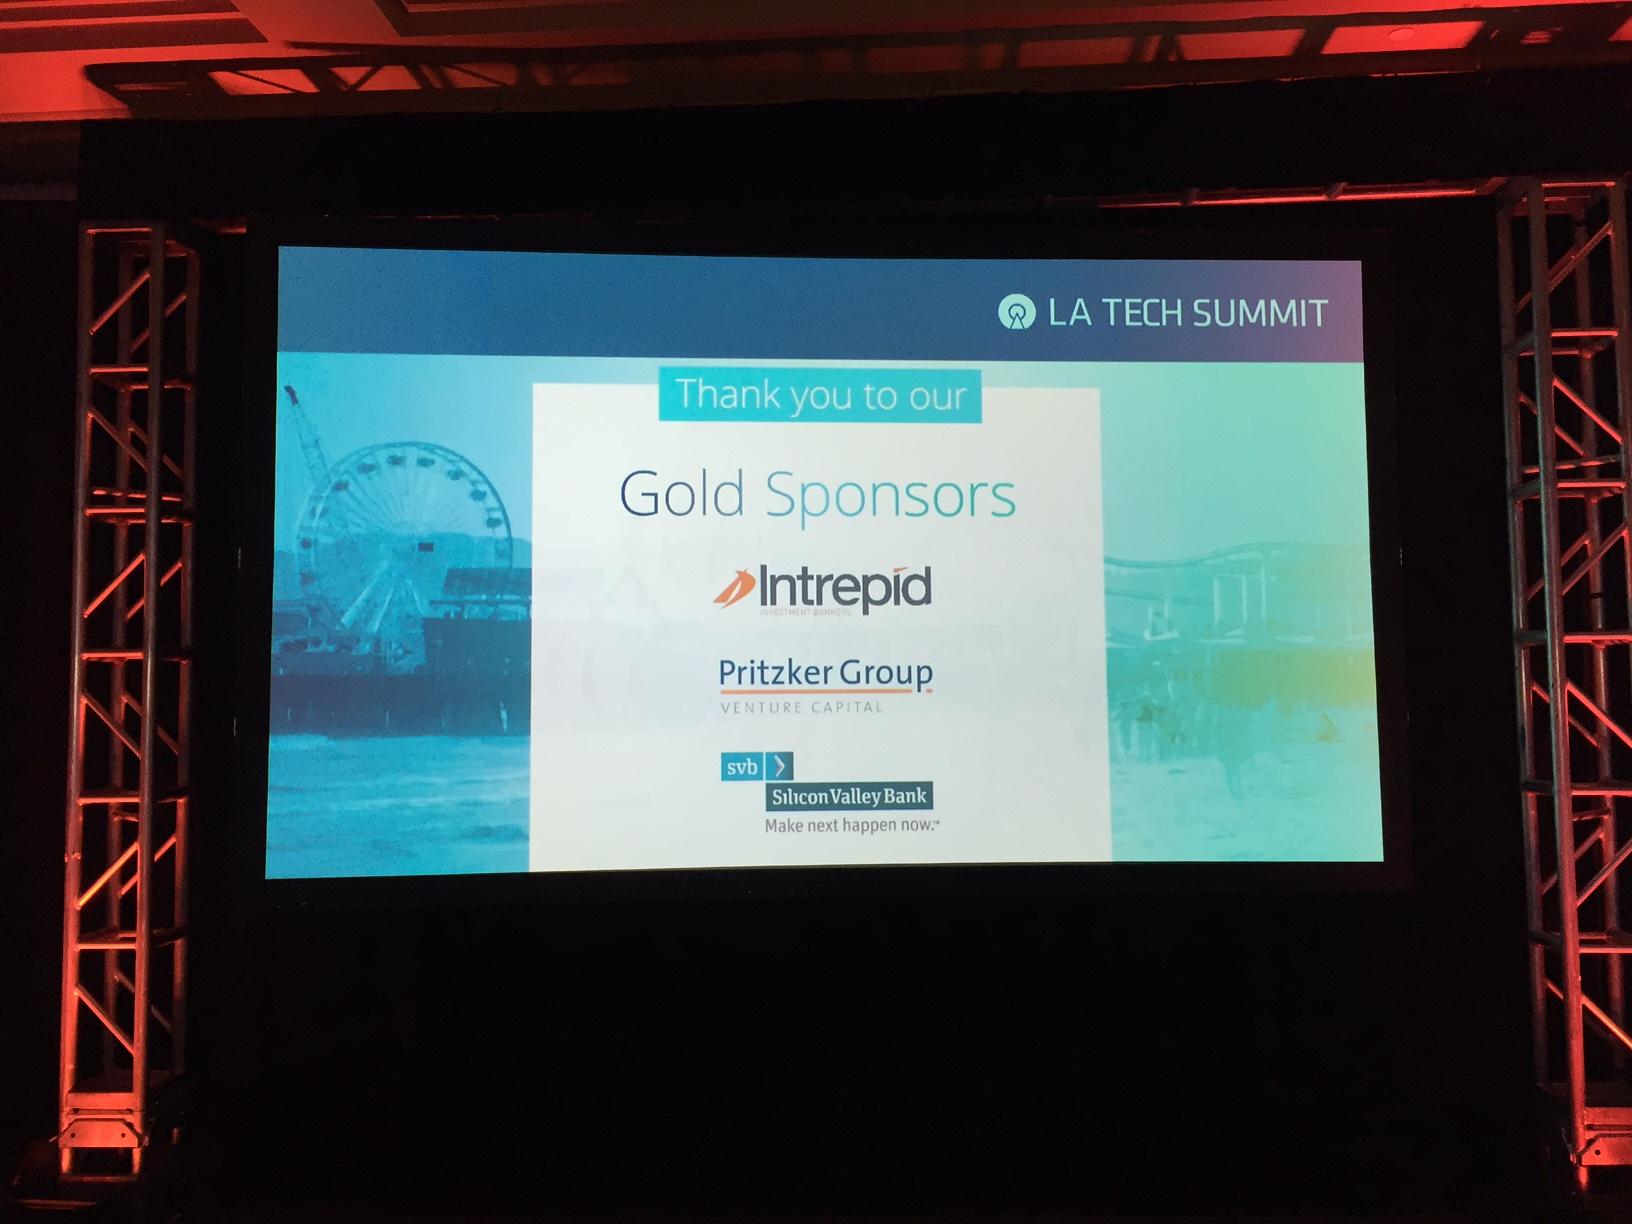 LA Tech Summit for Entrepreneurs, Venture Capitalists and Startups